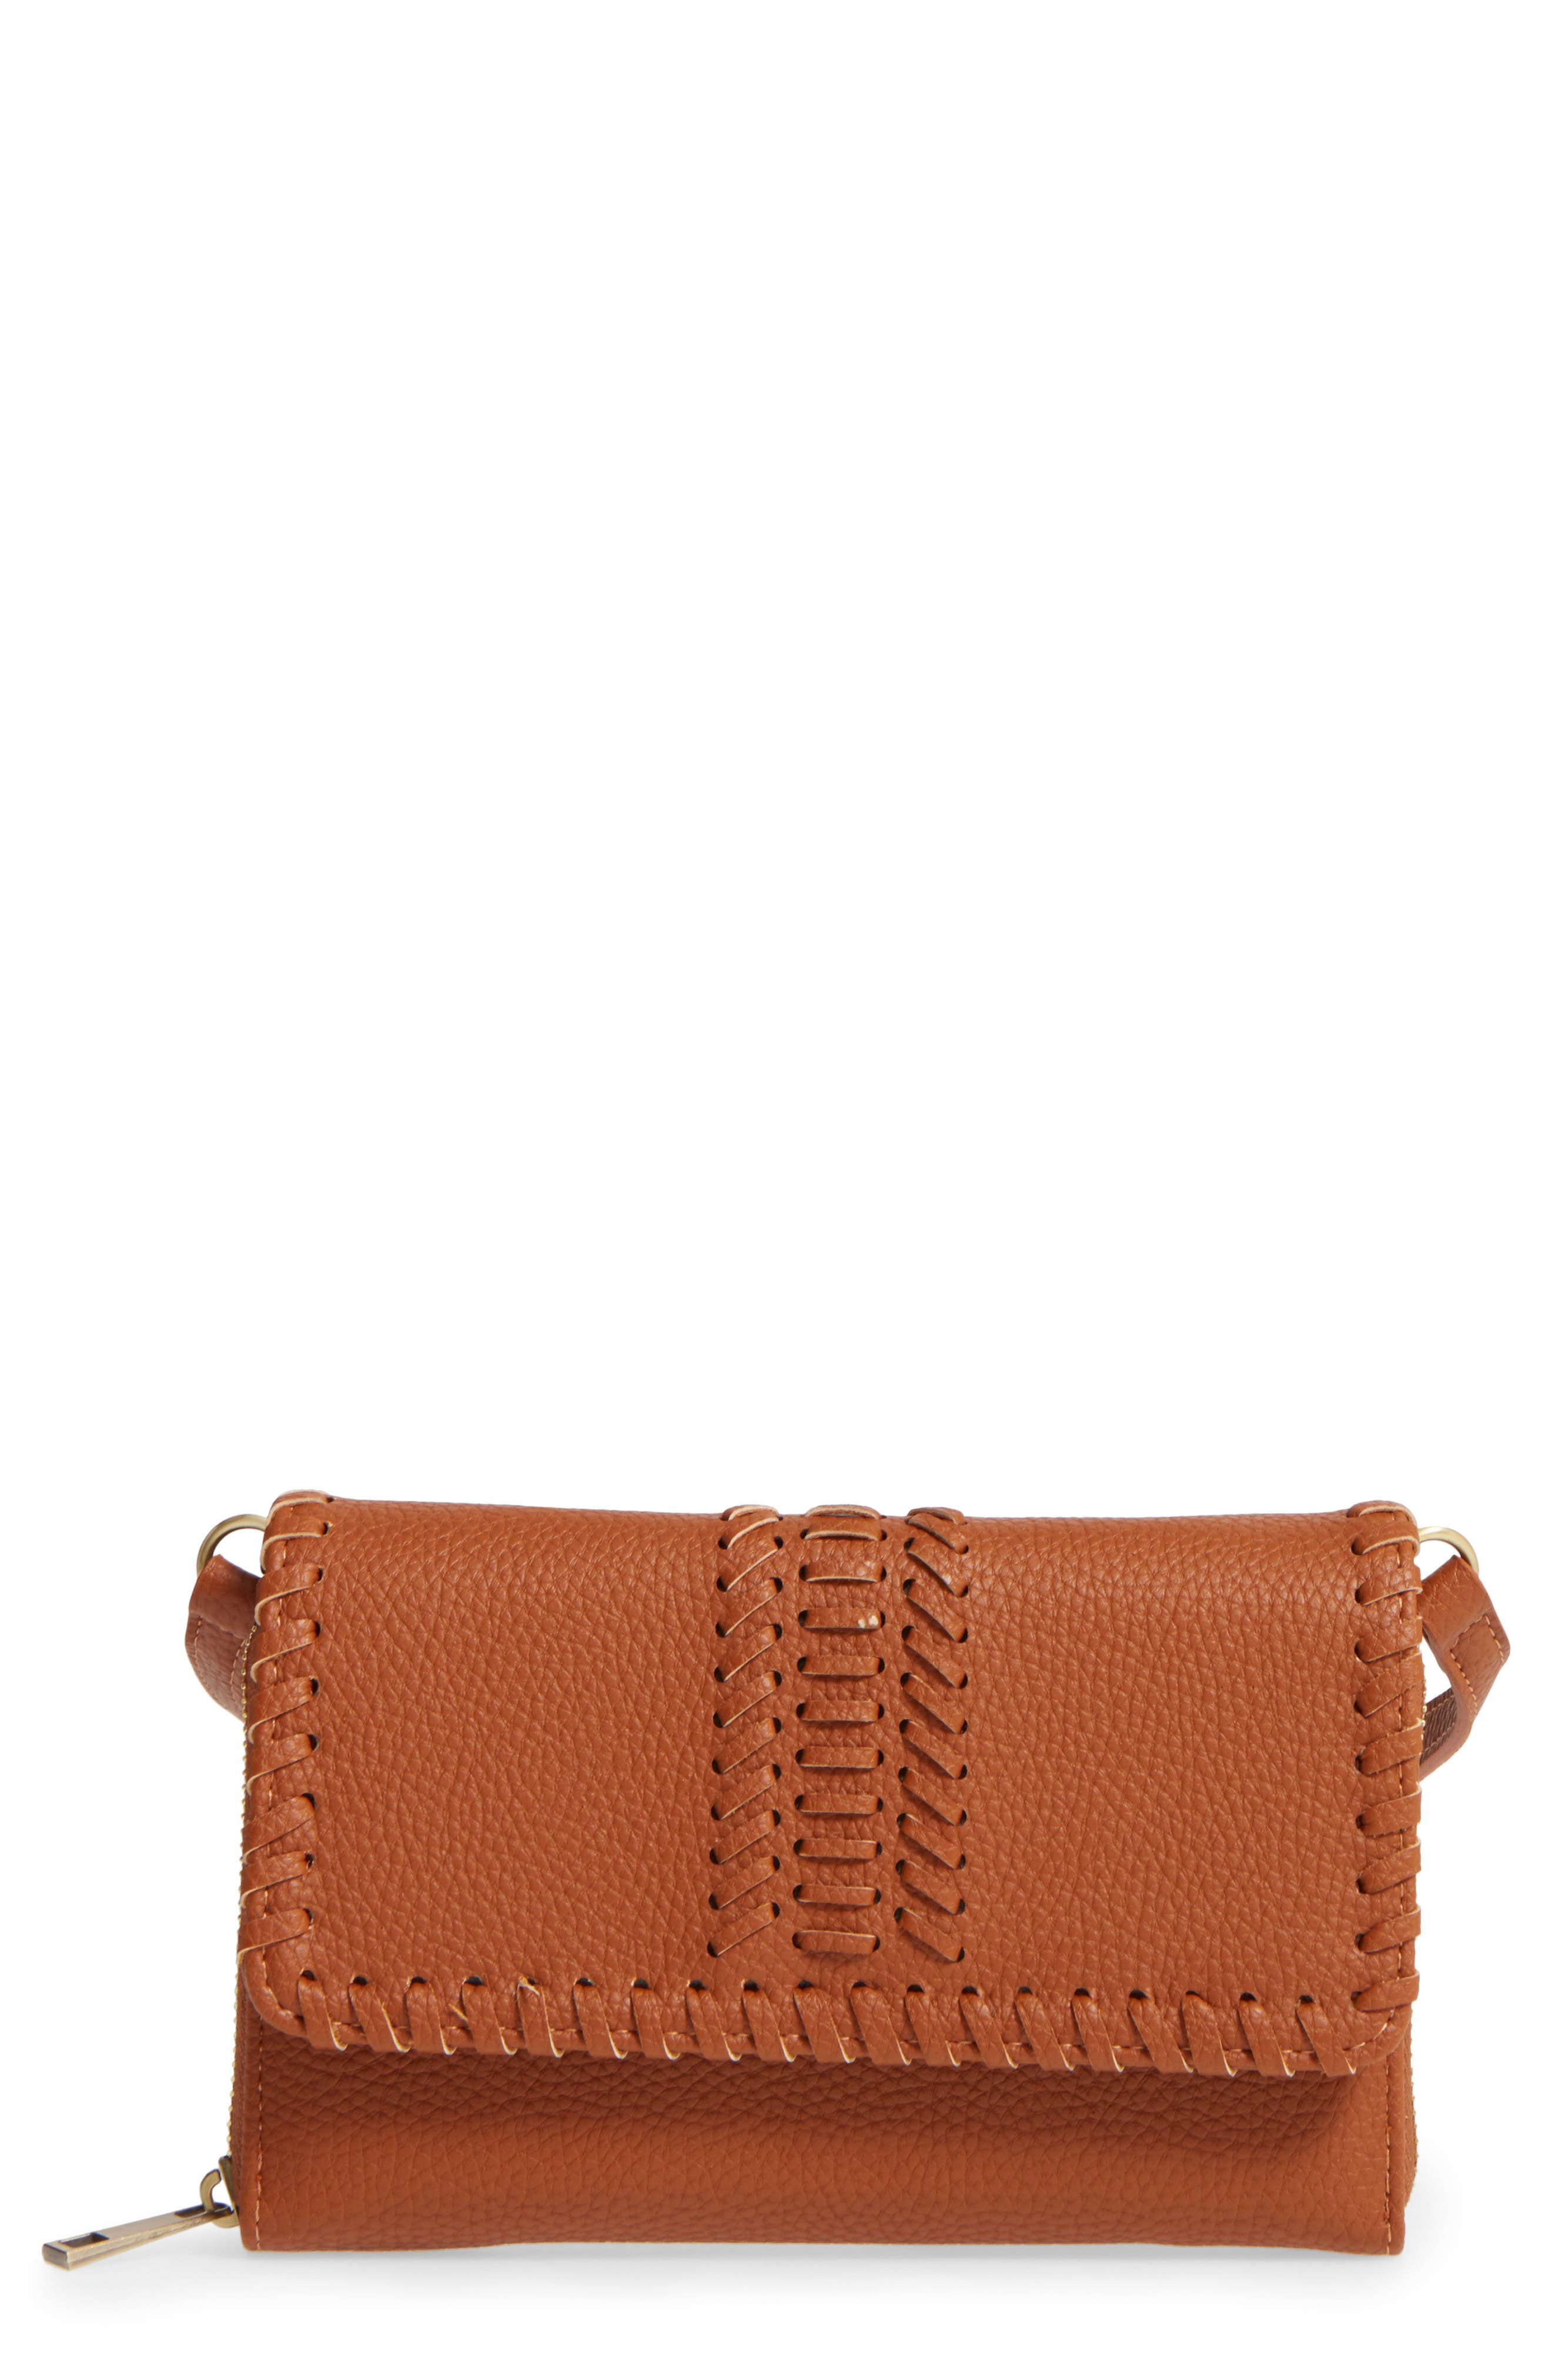 STREET LEVEL Saddle Stitch Convertible Faux Leather Crossbody Bag